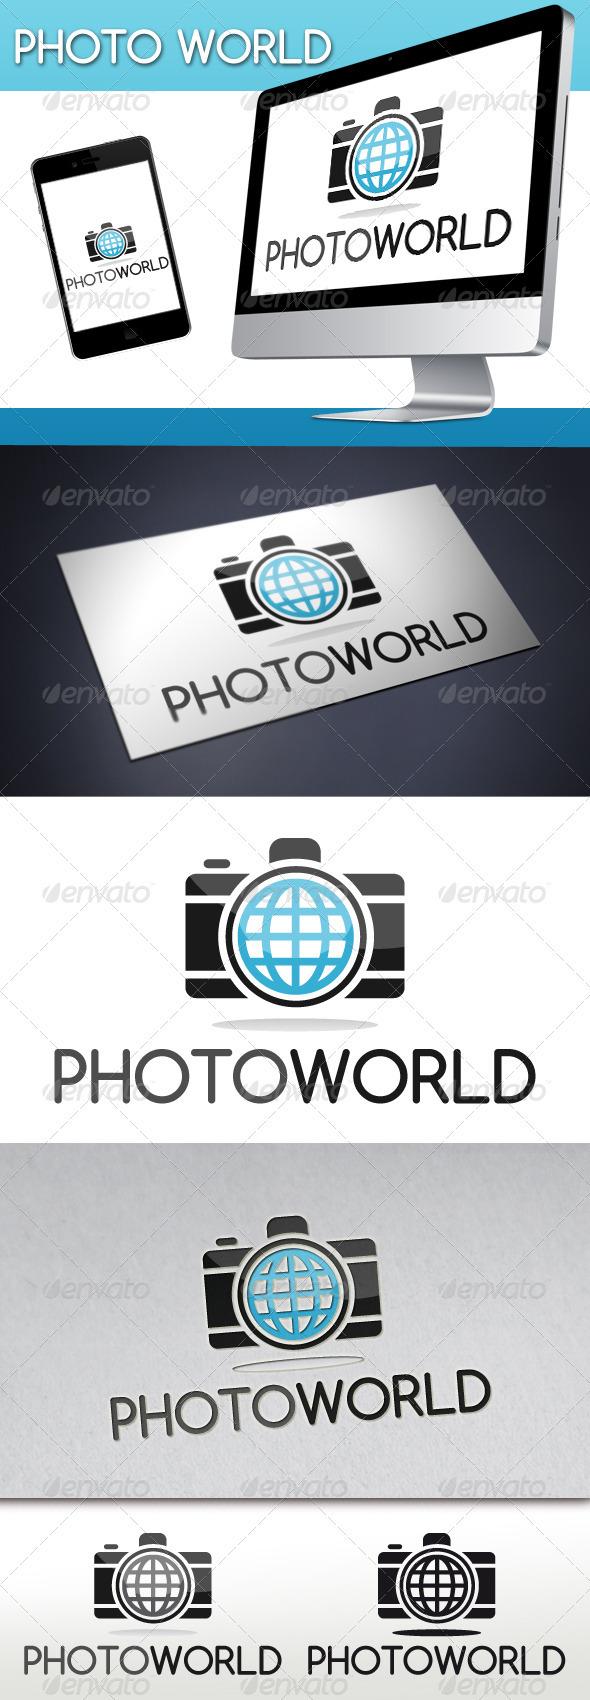 GraphicRiver Photo World Logo 3315594